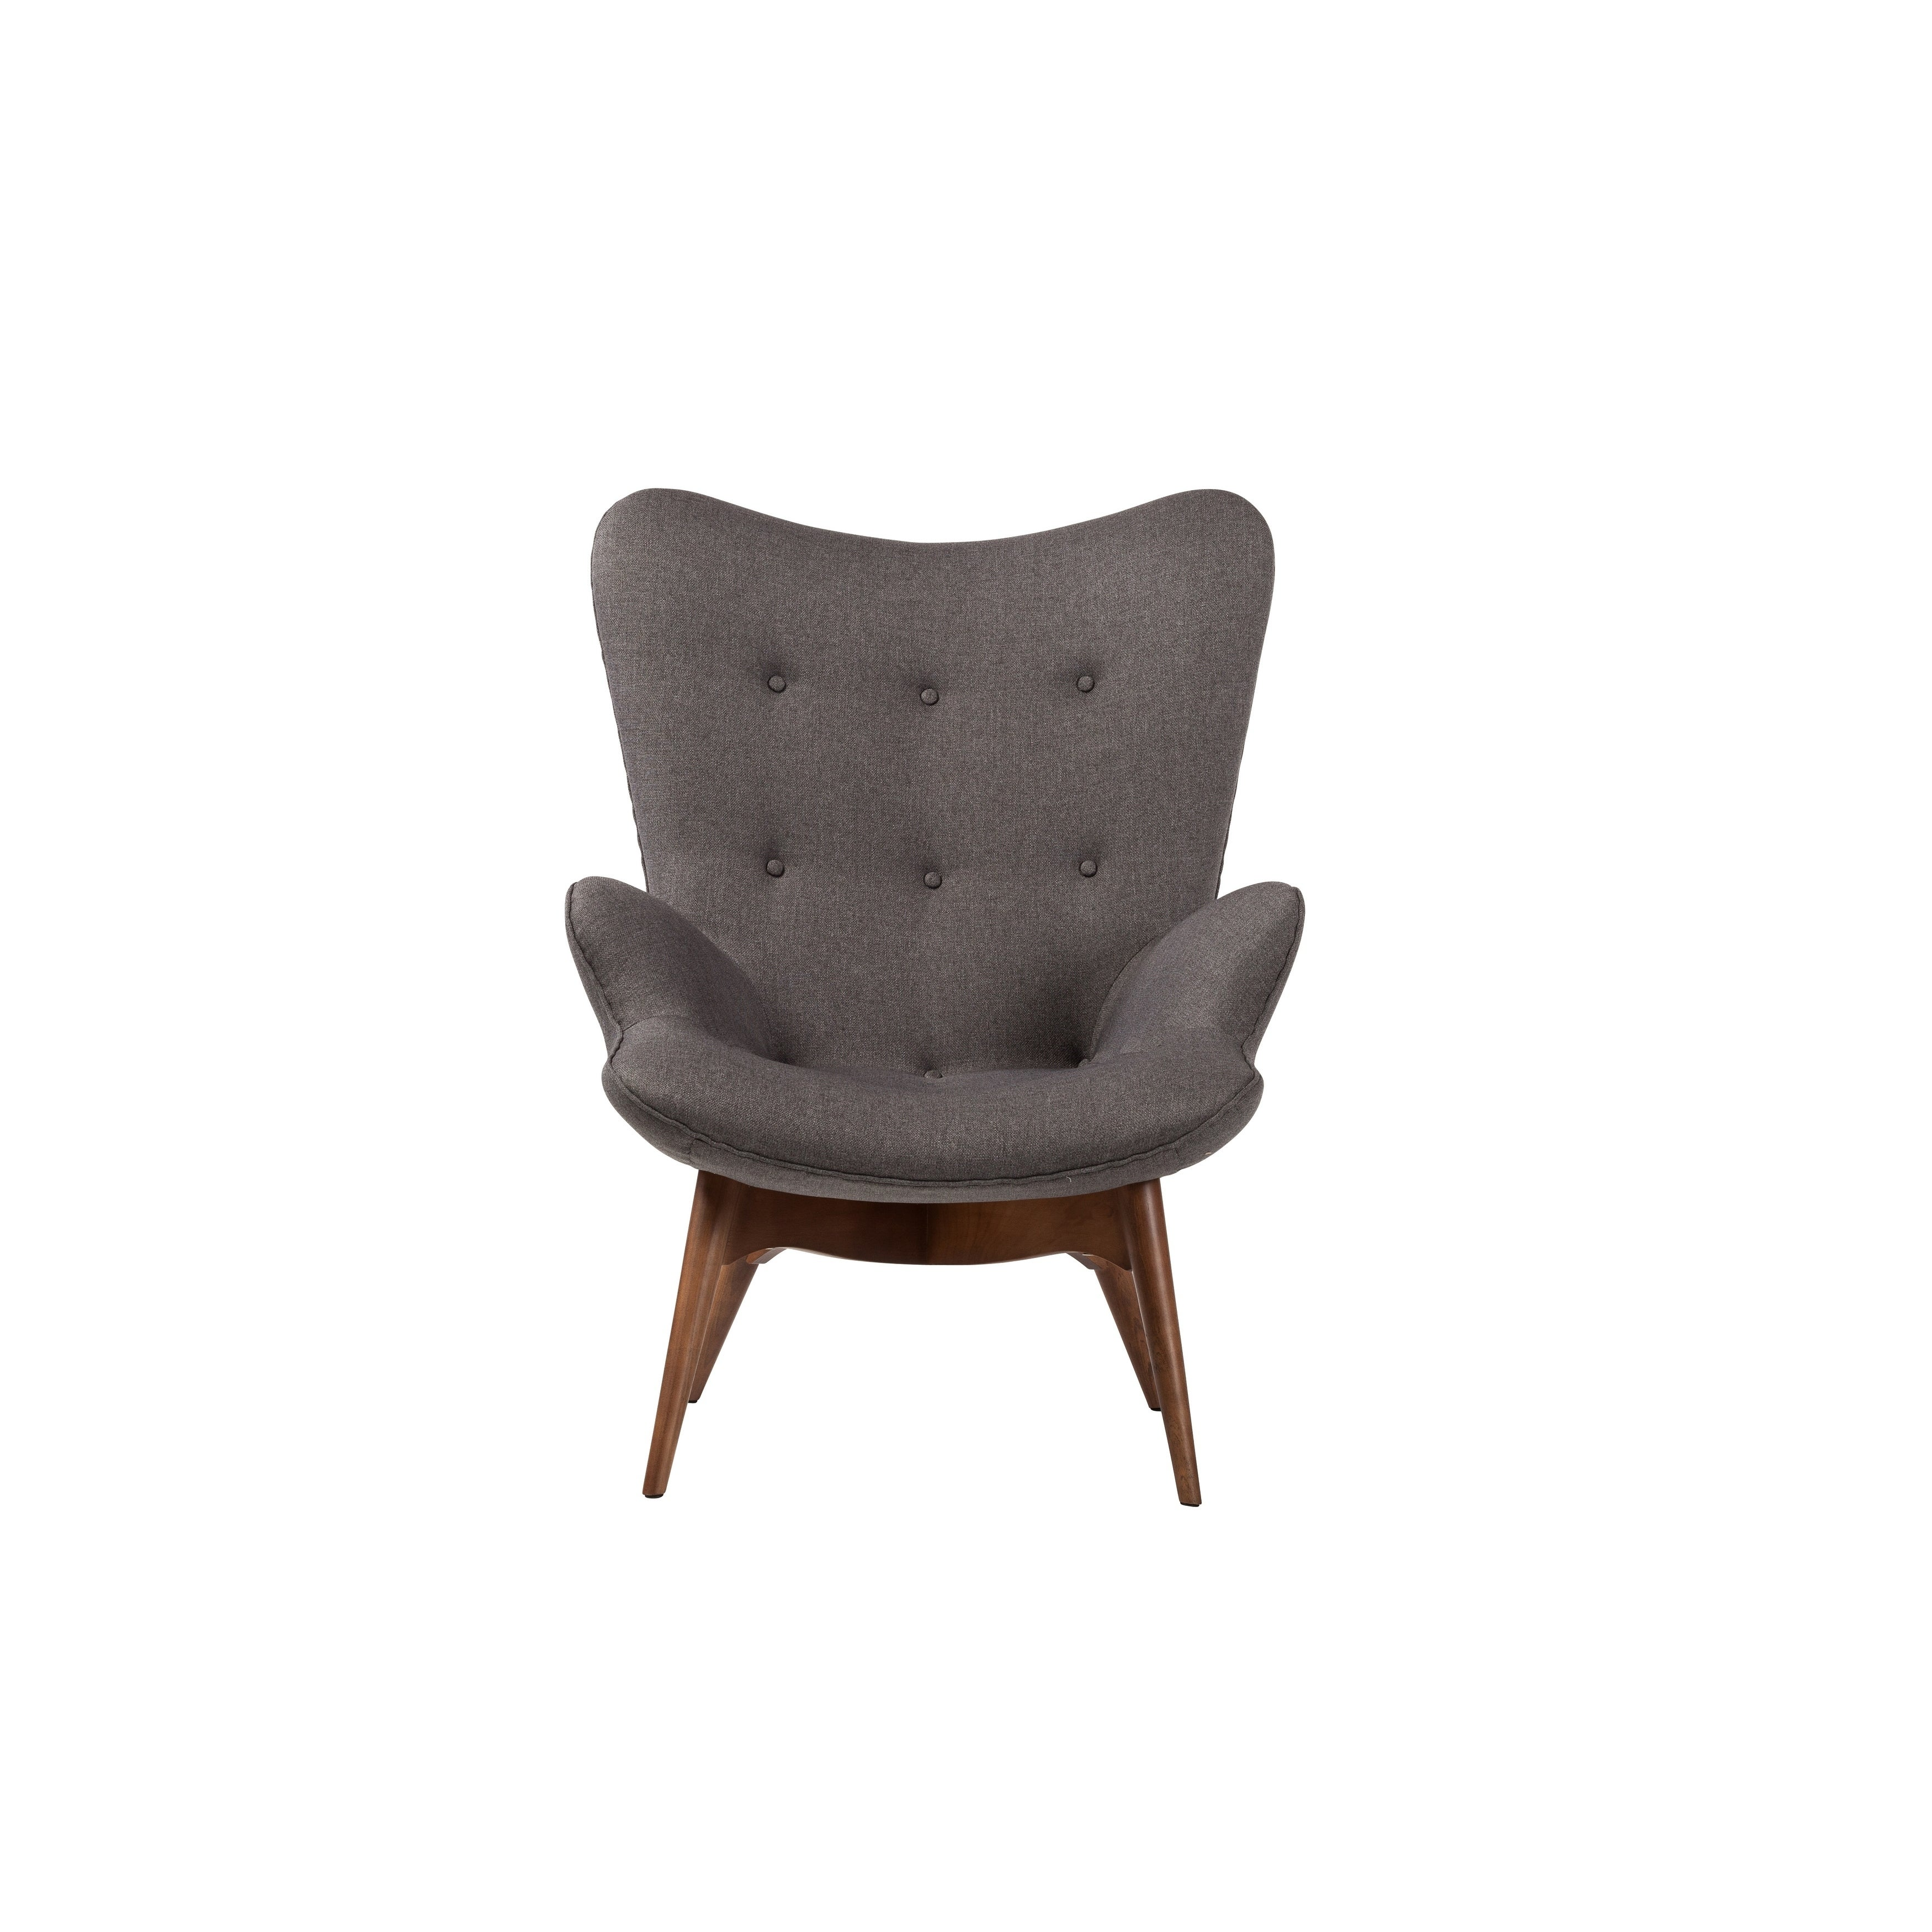 Super Aussie Contour Dark Grey Padded Lounge Chair Creativecarmelina Interior Chair Design Creativecarmelinacom